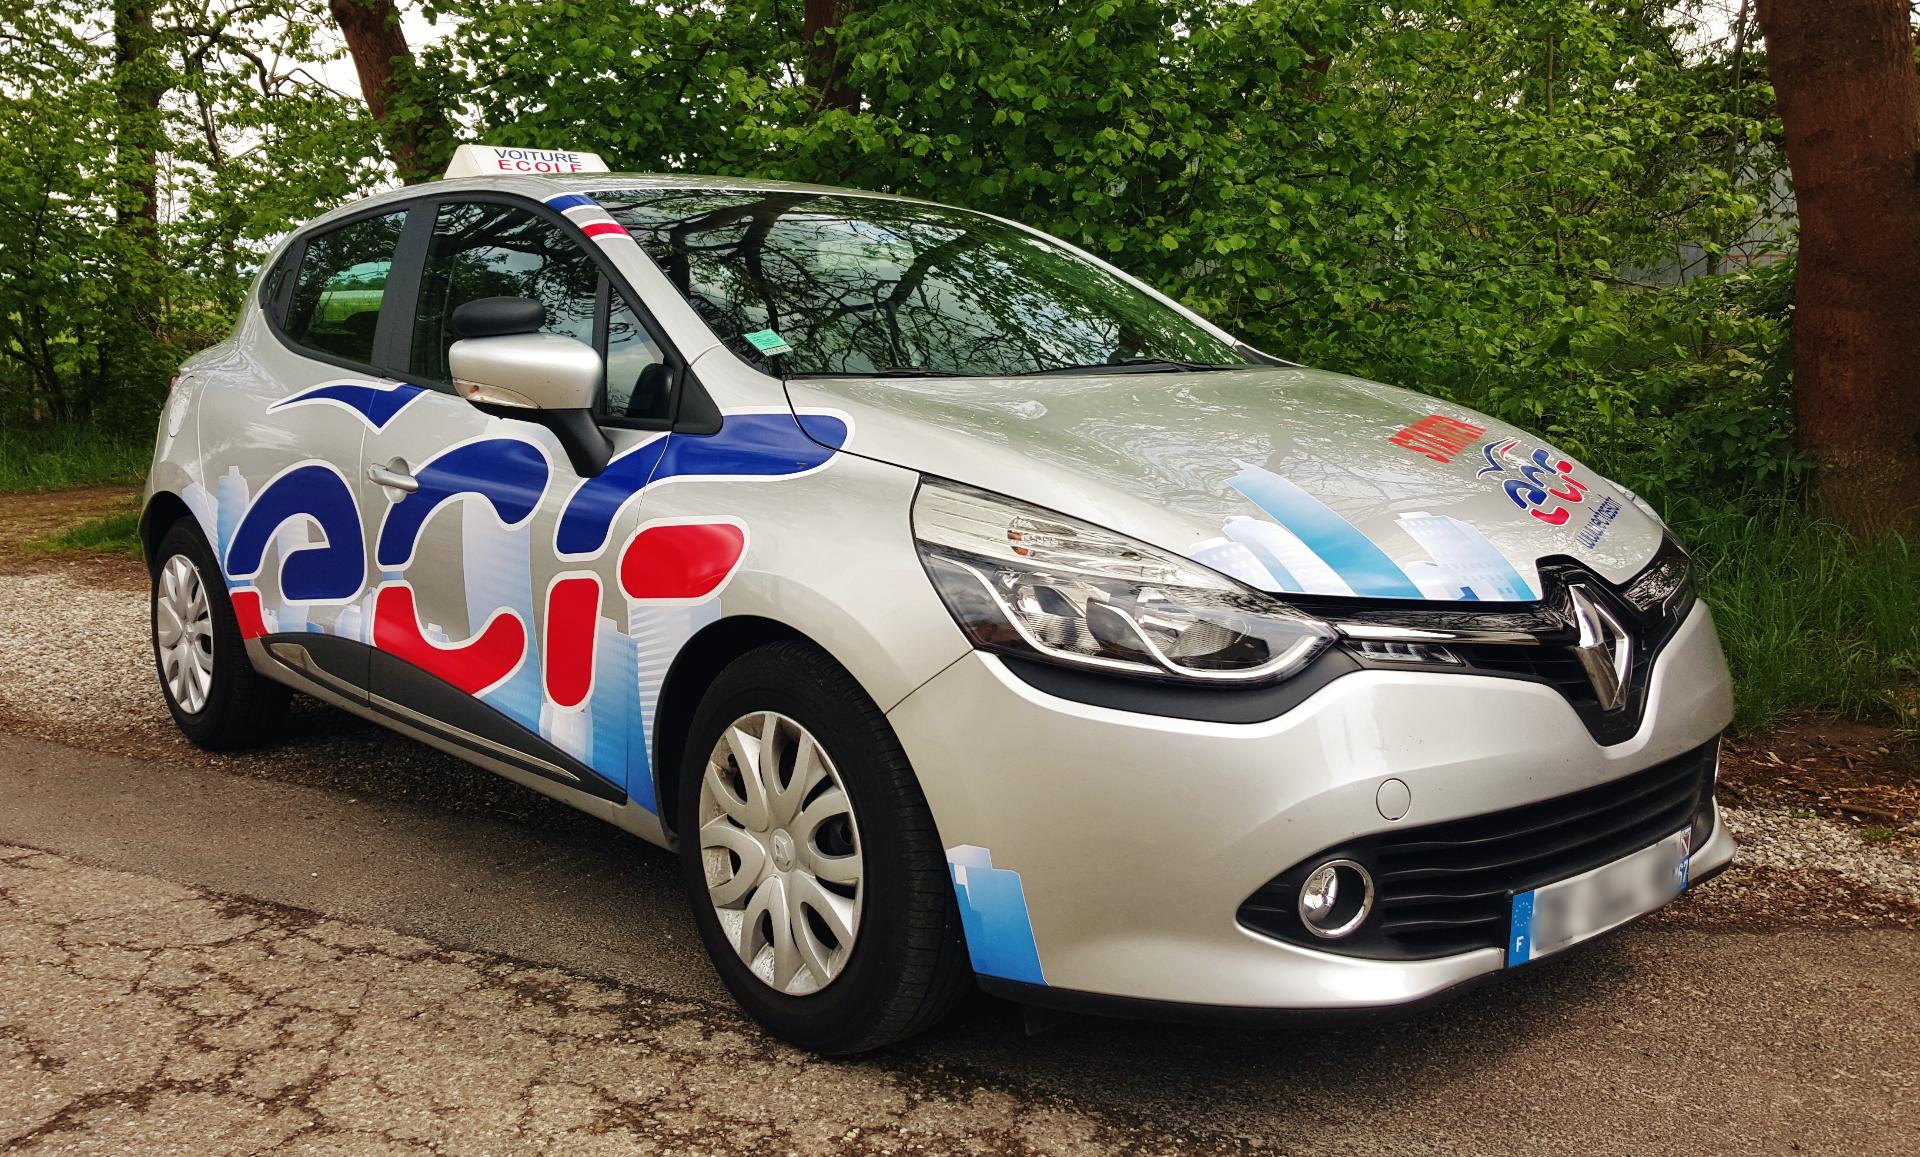 Nos voitures ECF - Clio 4